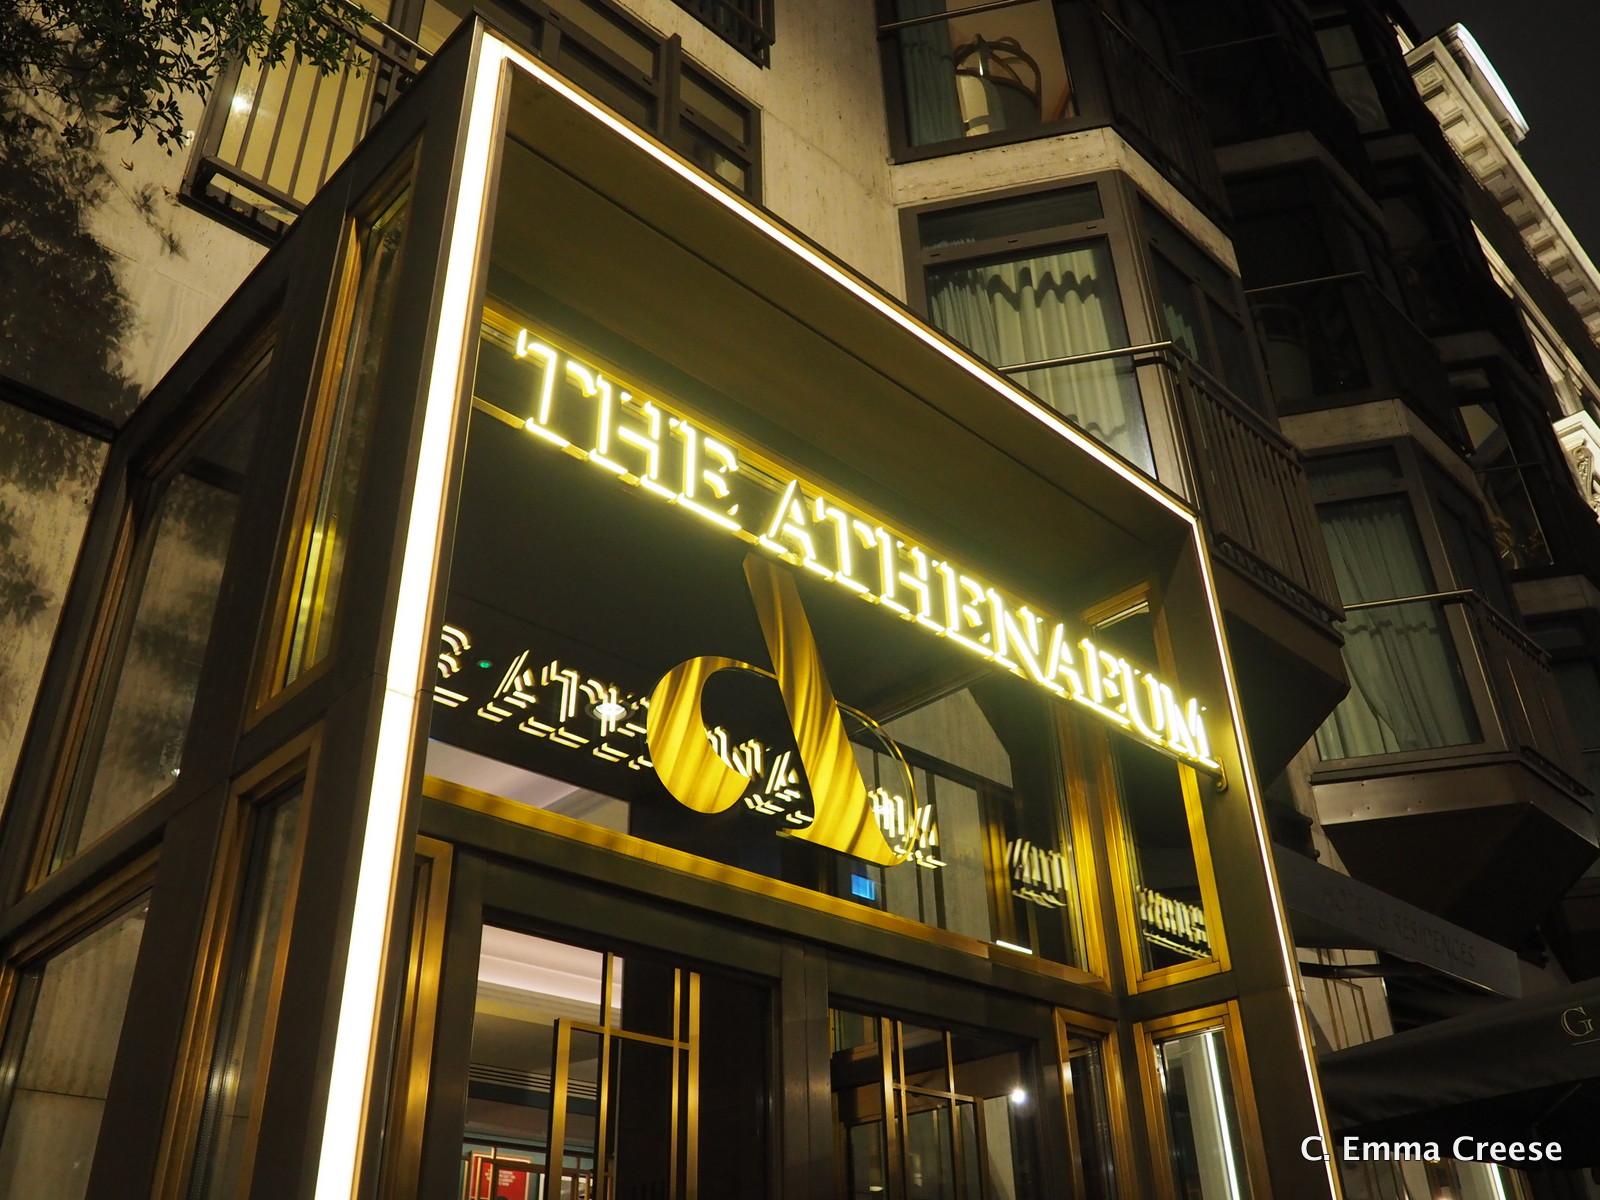 Galvin At The Athenaeum Hotel Luxury Restaurant Adventures of a London Kiwi